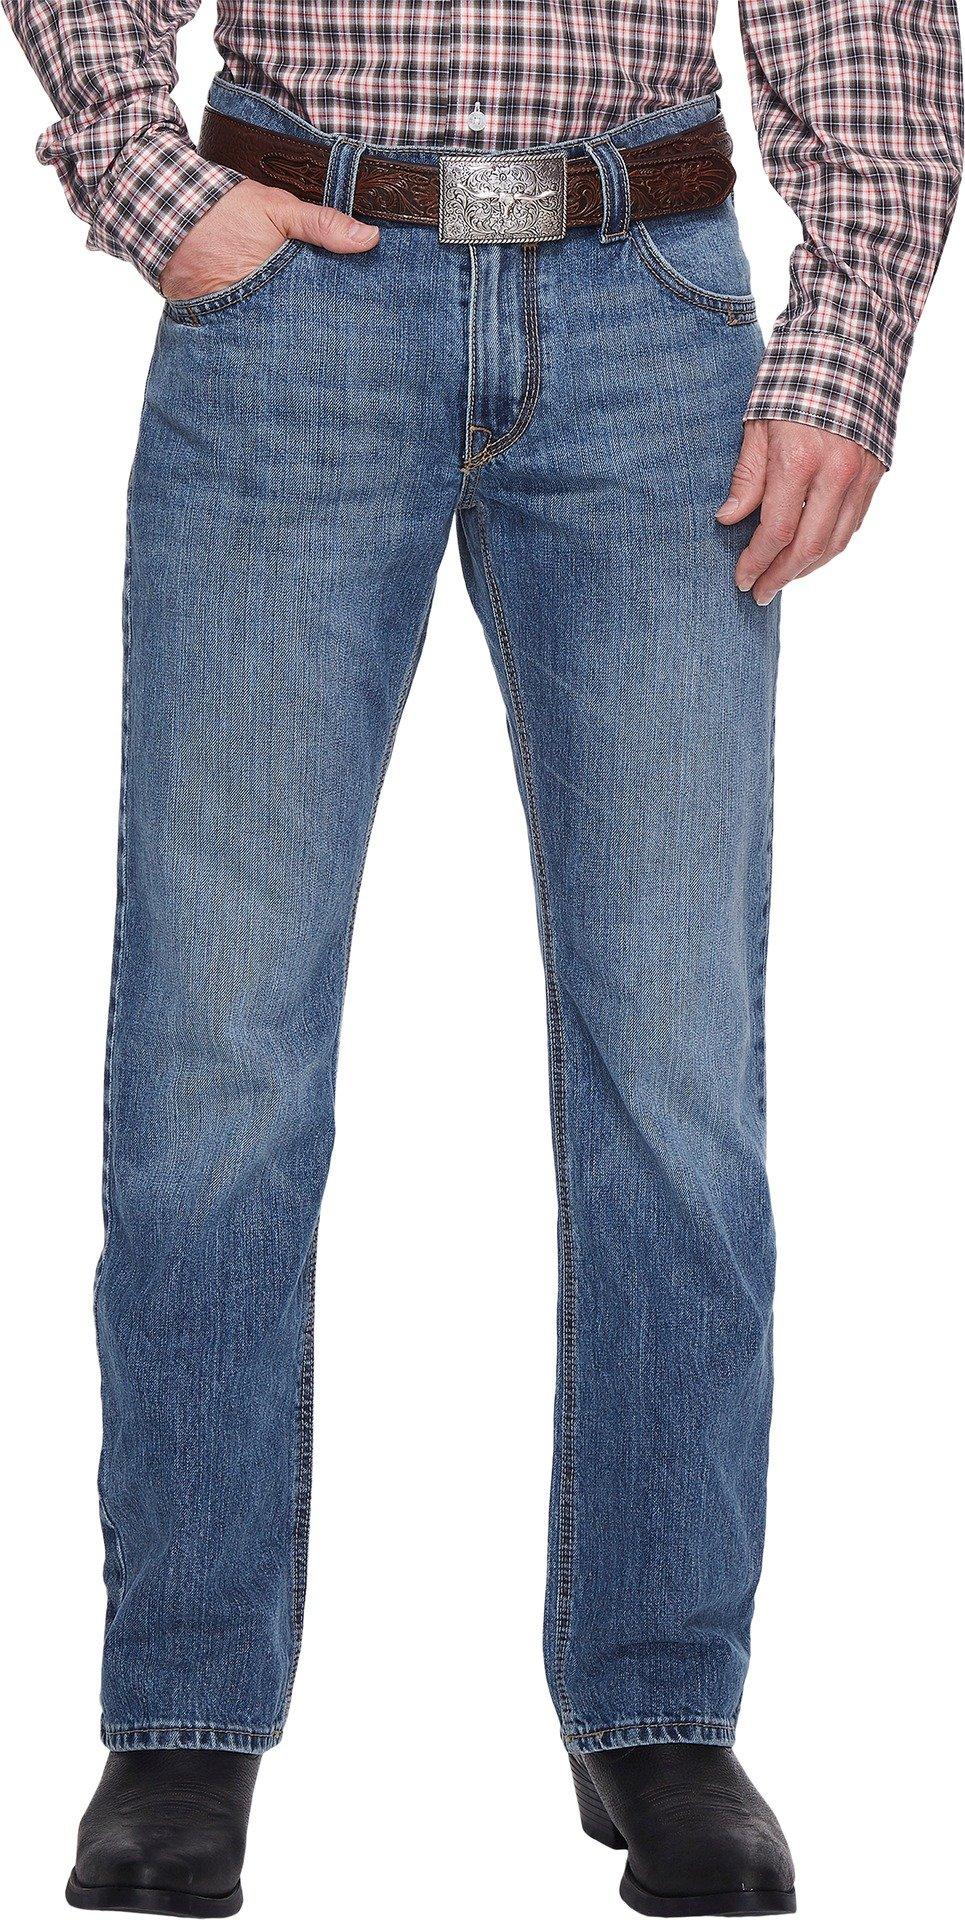 Cinch Men's Carter 2.0 Light Stonewash Relaxed Fit Jeans Boot Cut Indigo 40W x 34L